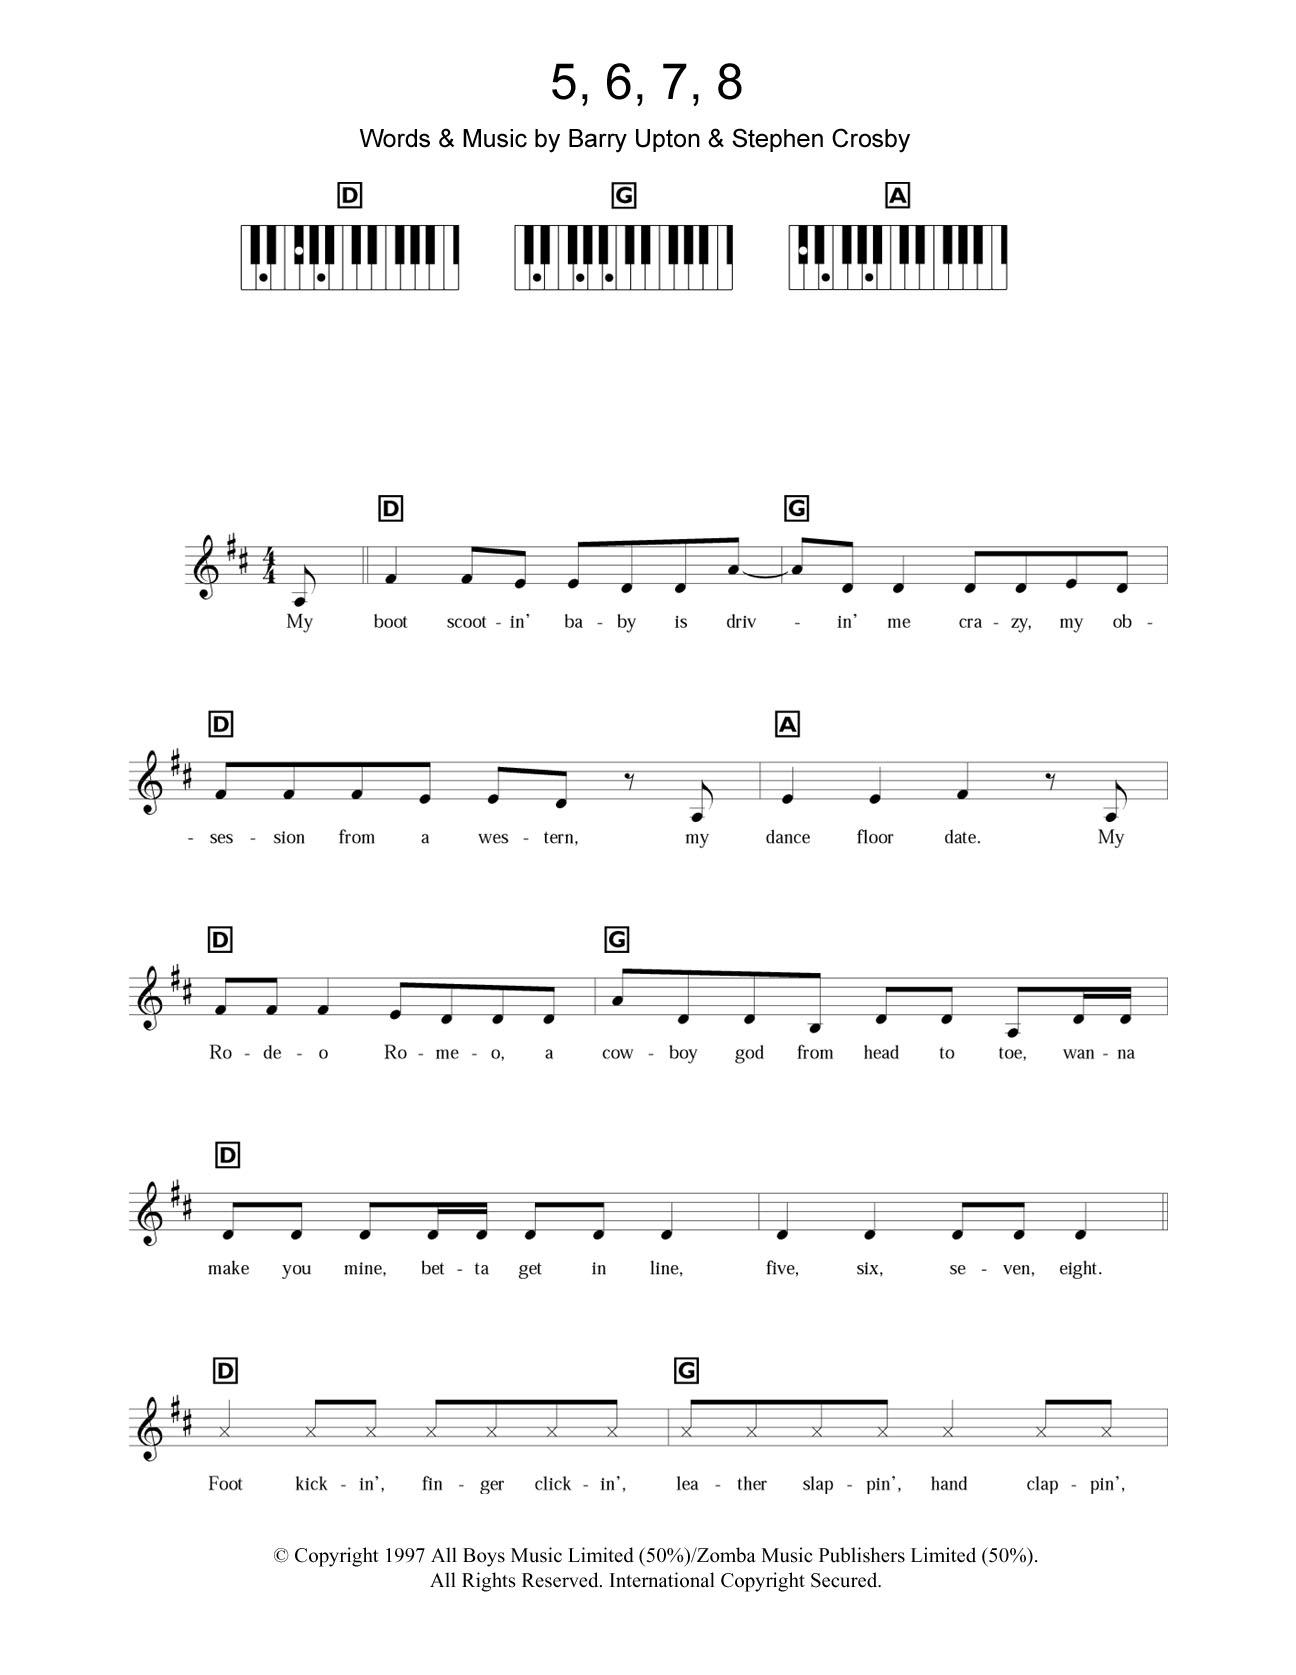 Steps: 5, 6, 7, 8